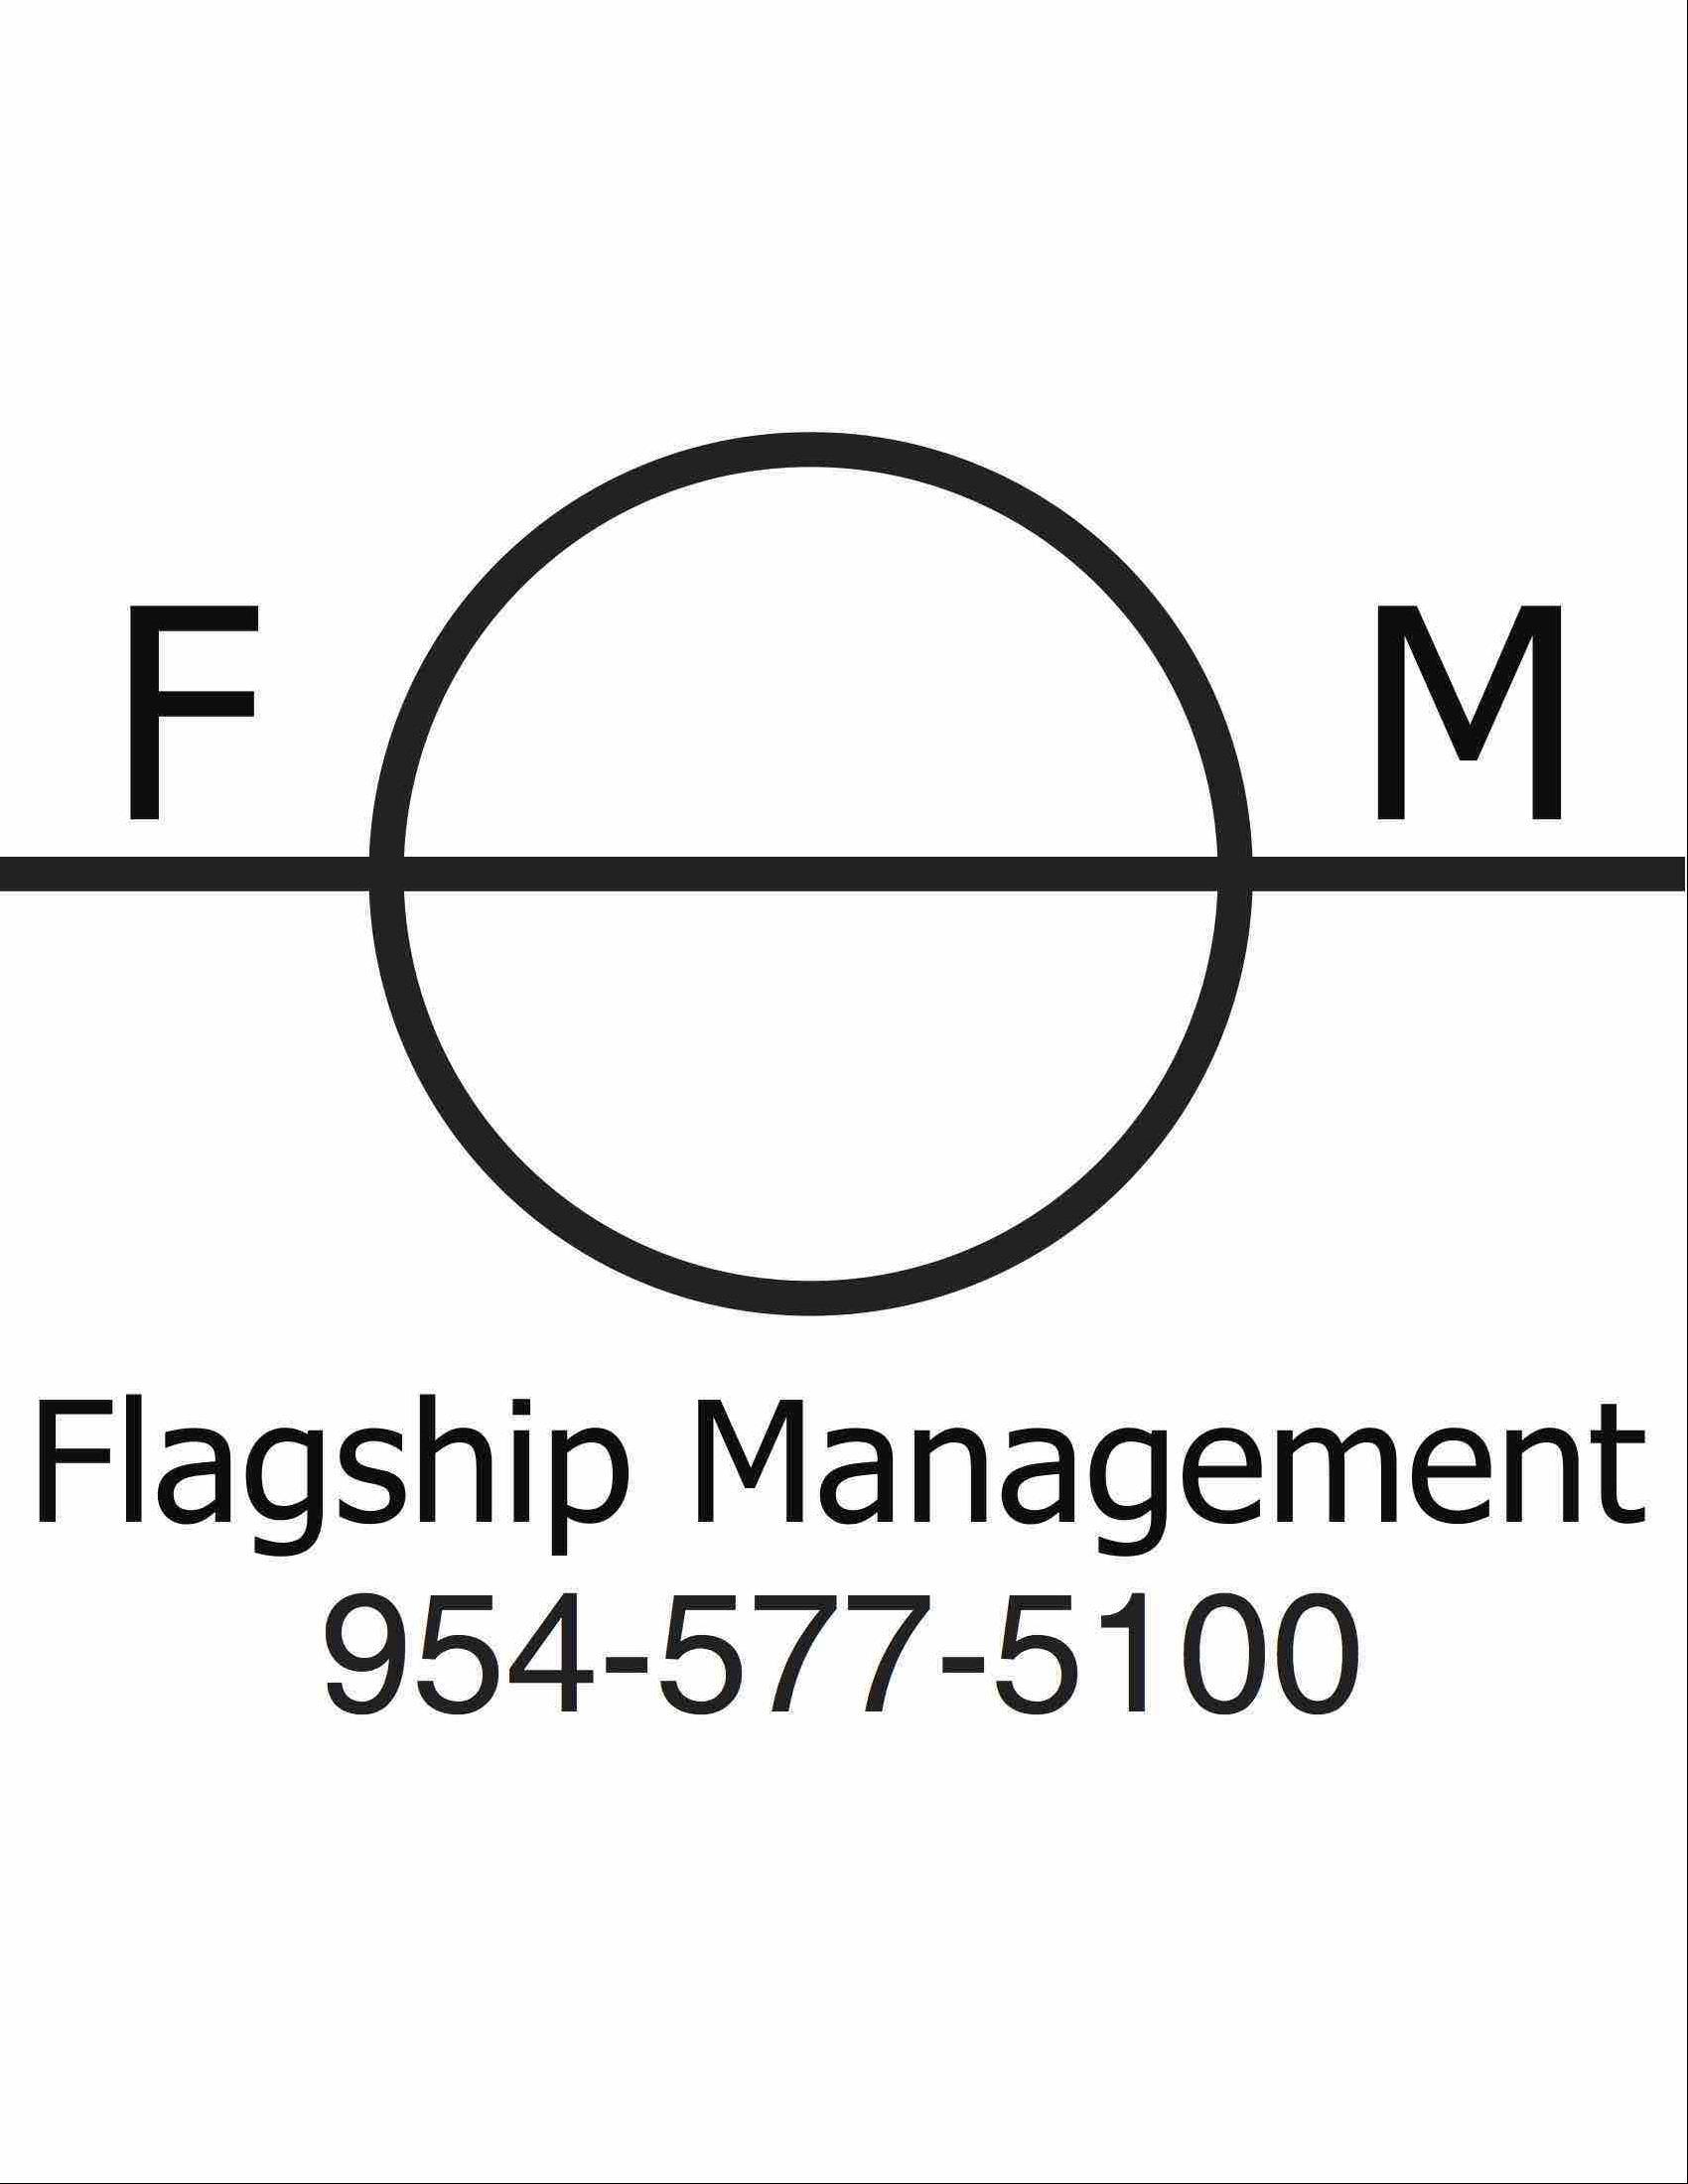 Flagship Management logo